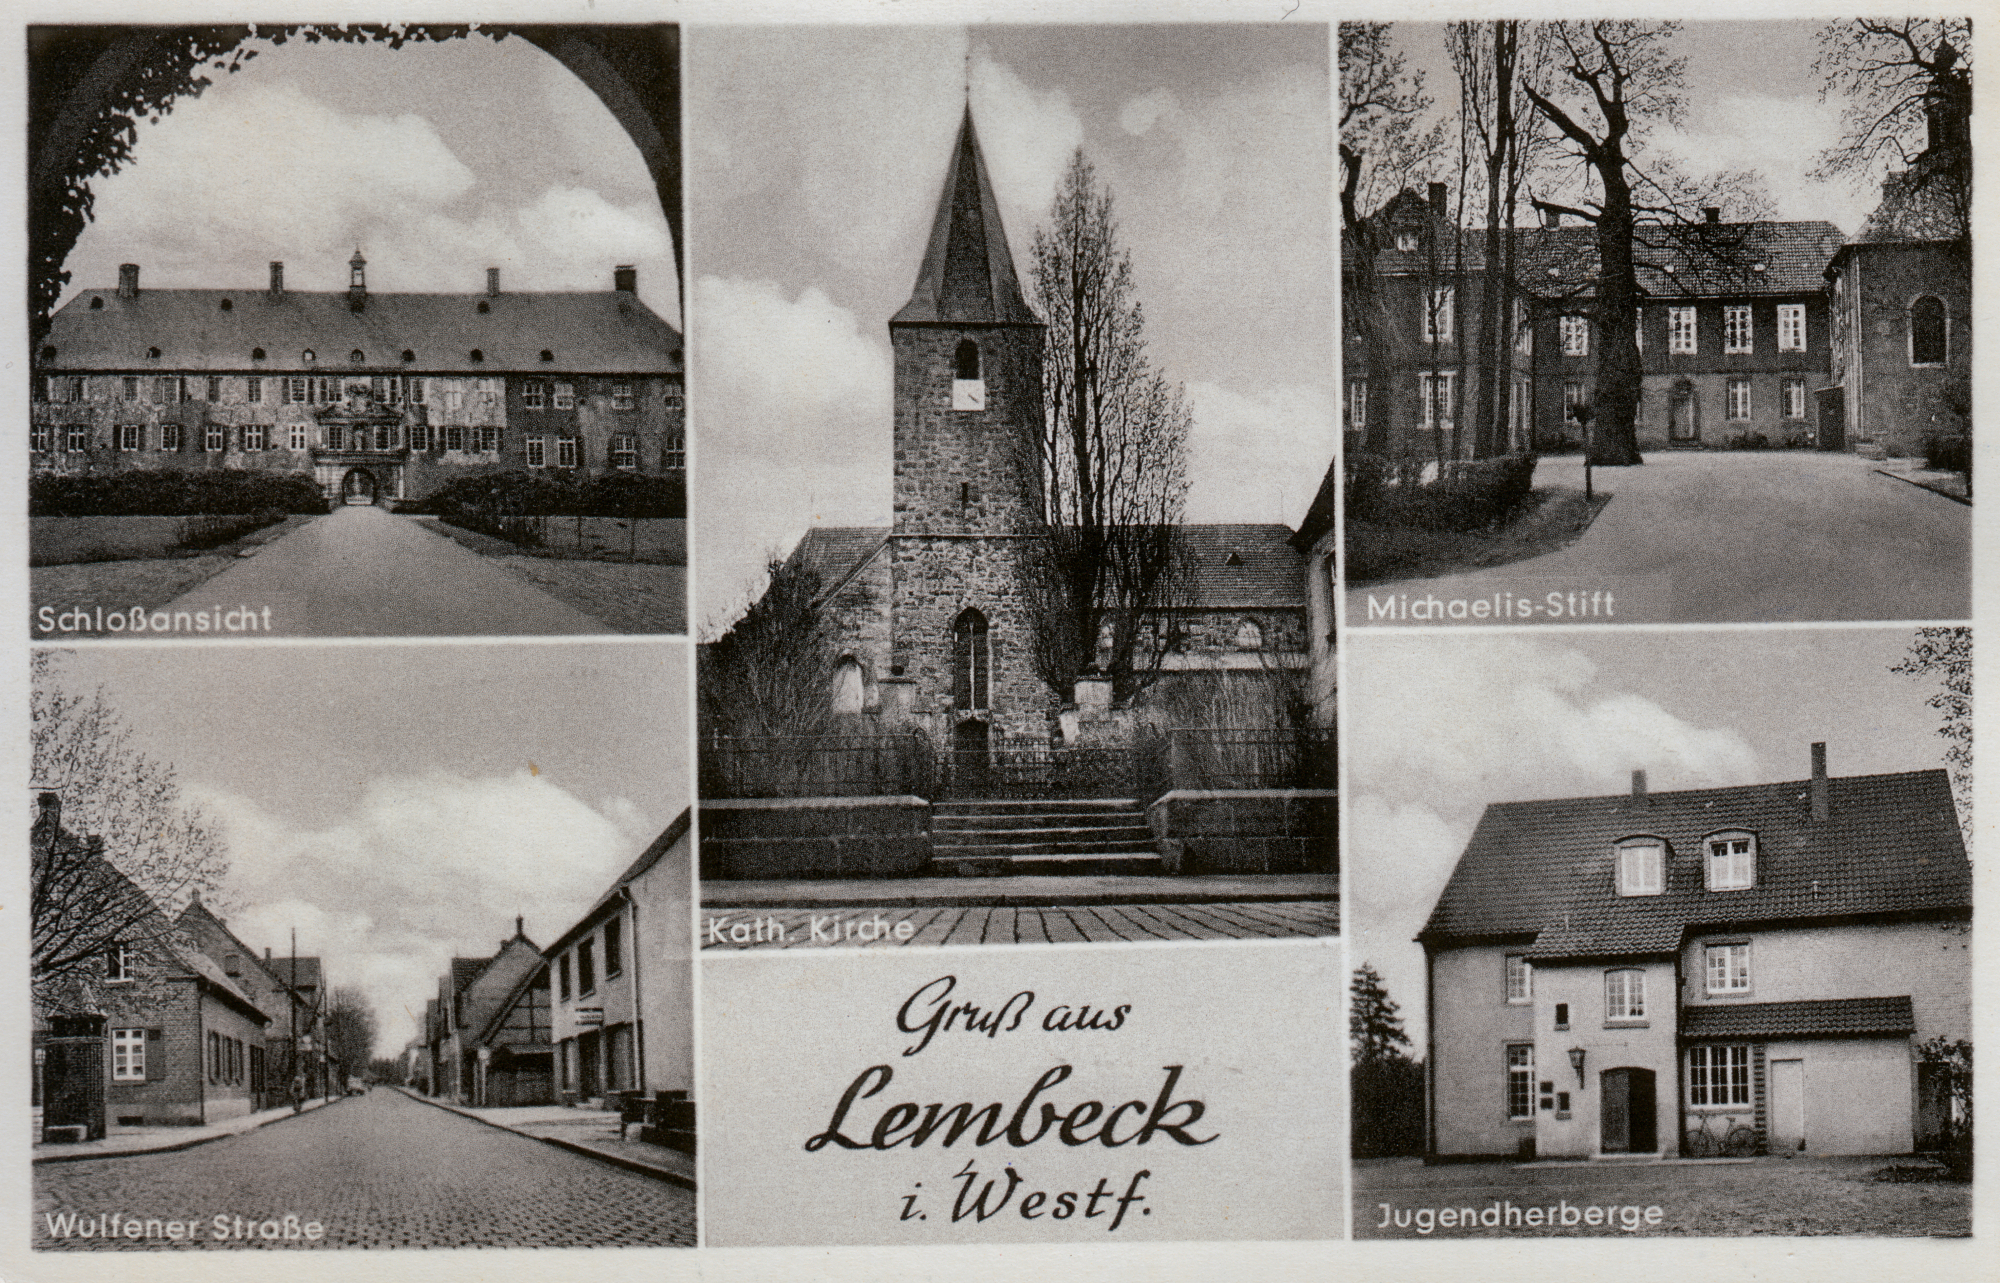 Postkarte, Ansichtskarte, Lembeck